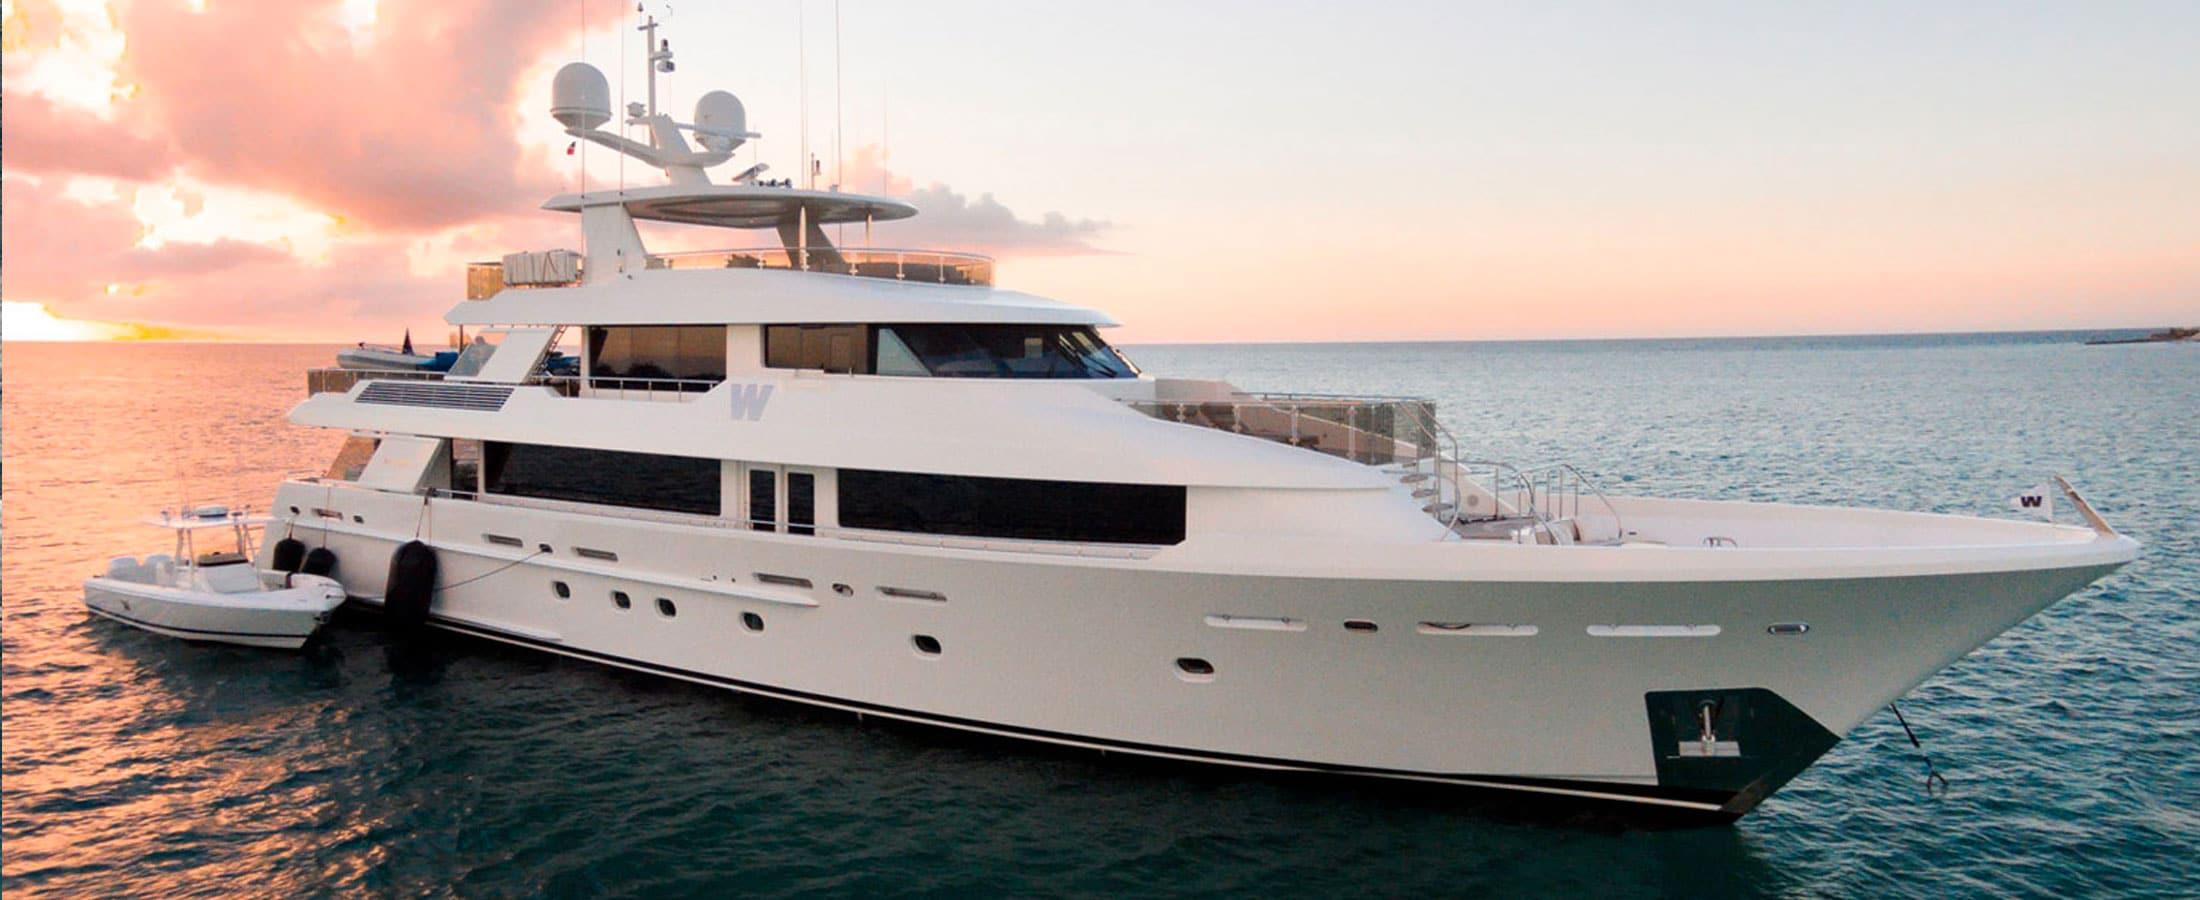 Westport 130   W130 Model (40m)   Tri-Deck Luxury Motor Yacht